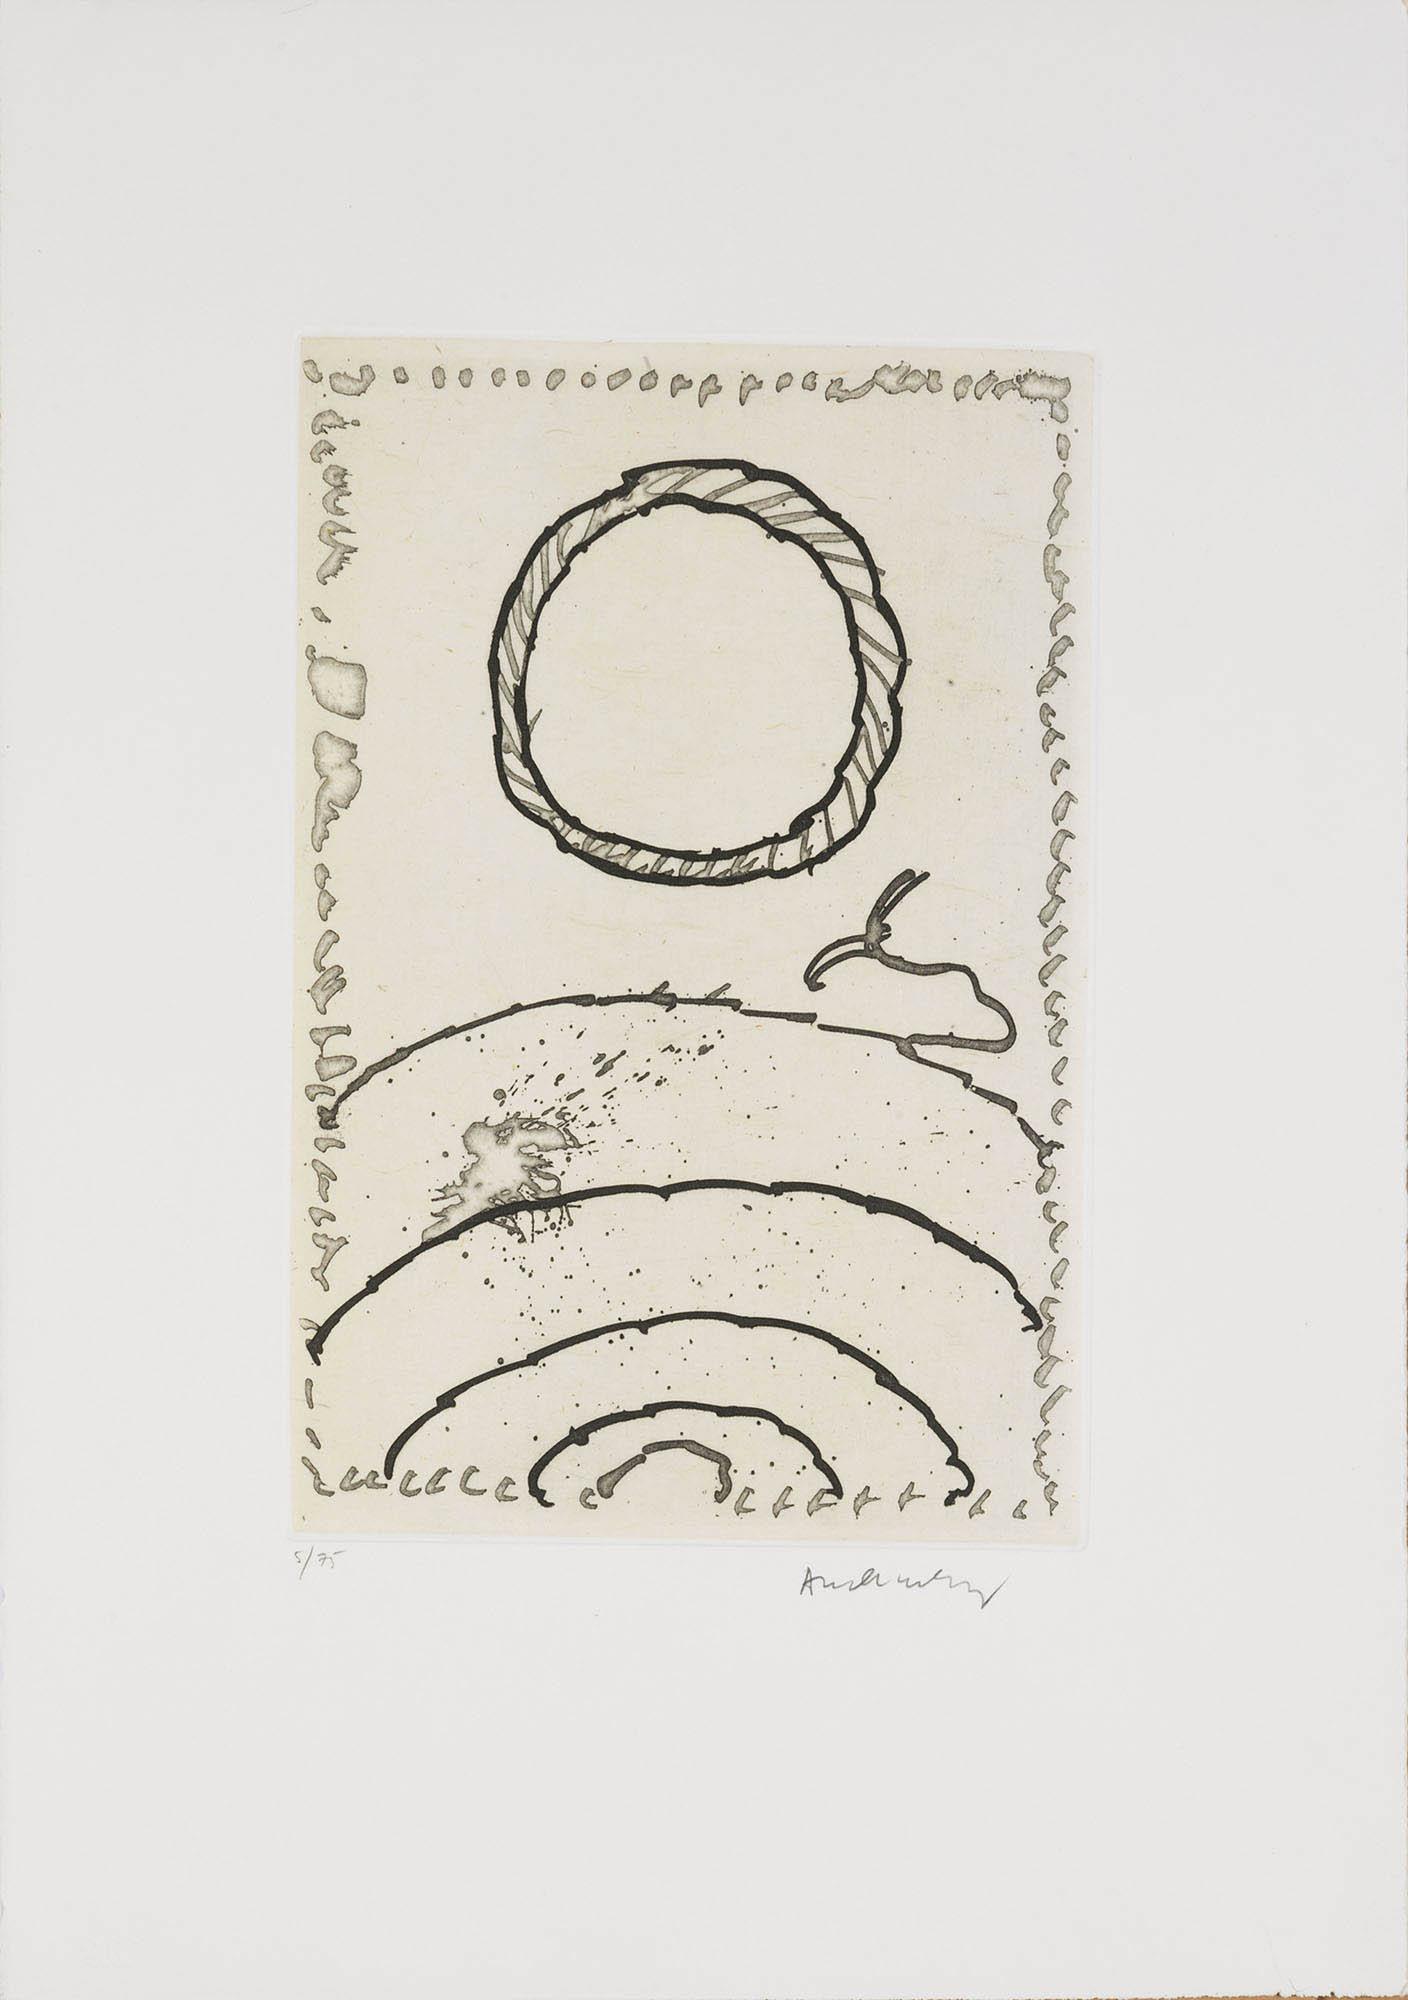 Cerclitude, 1973